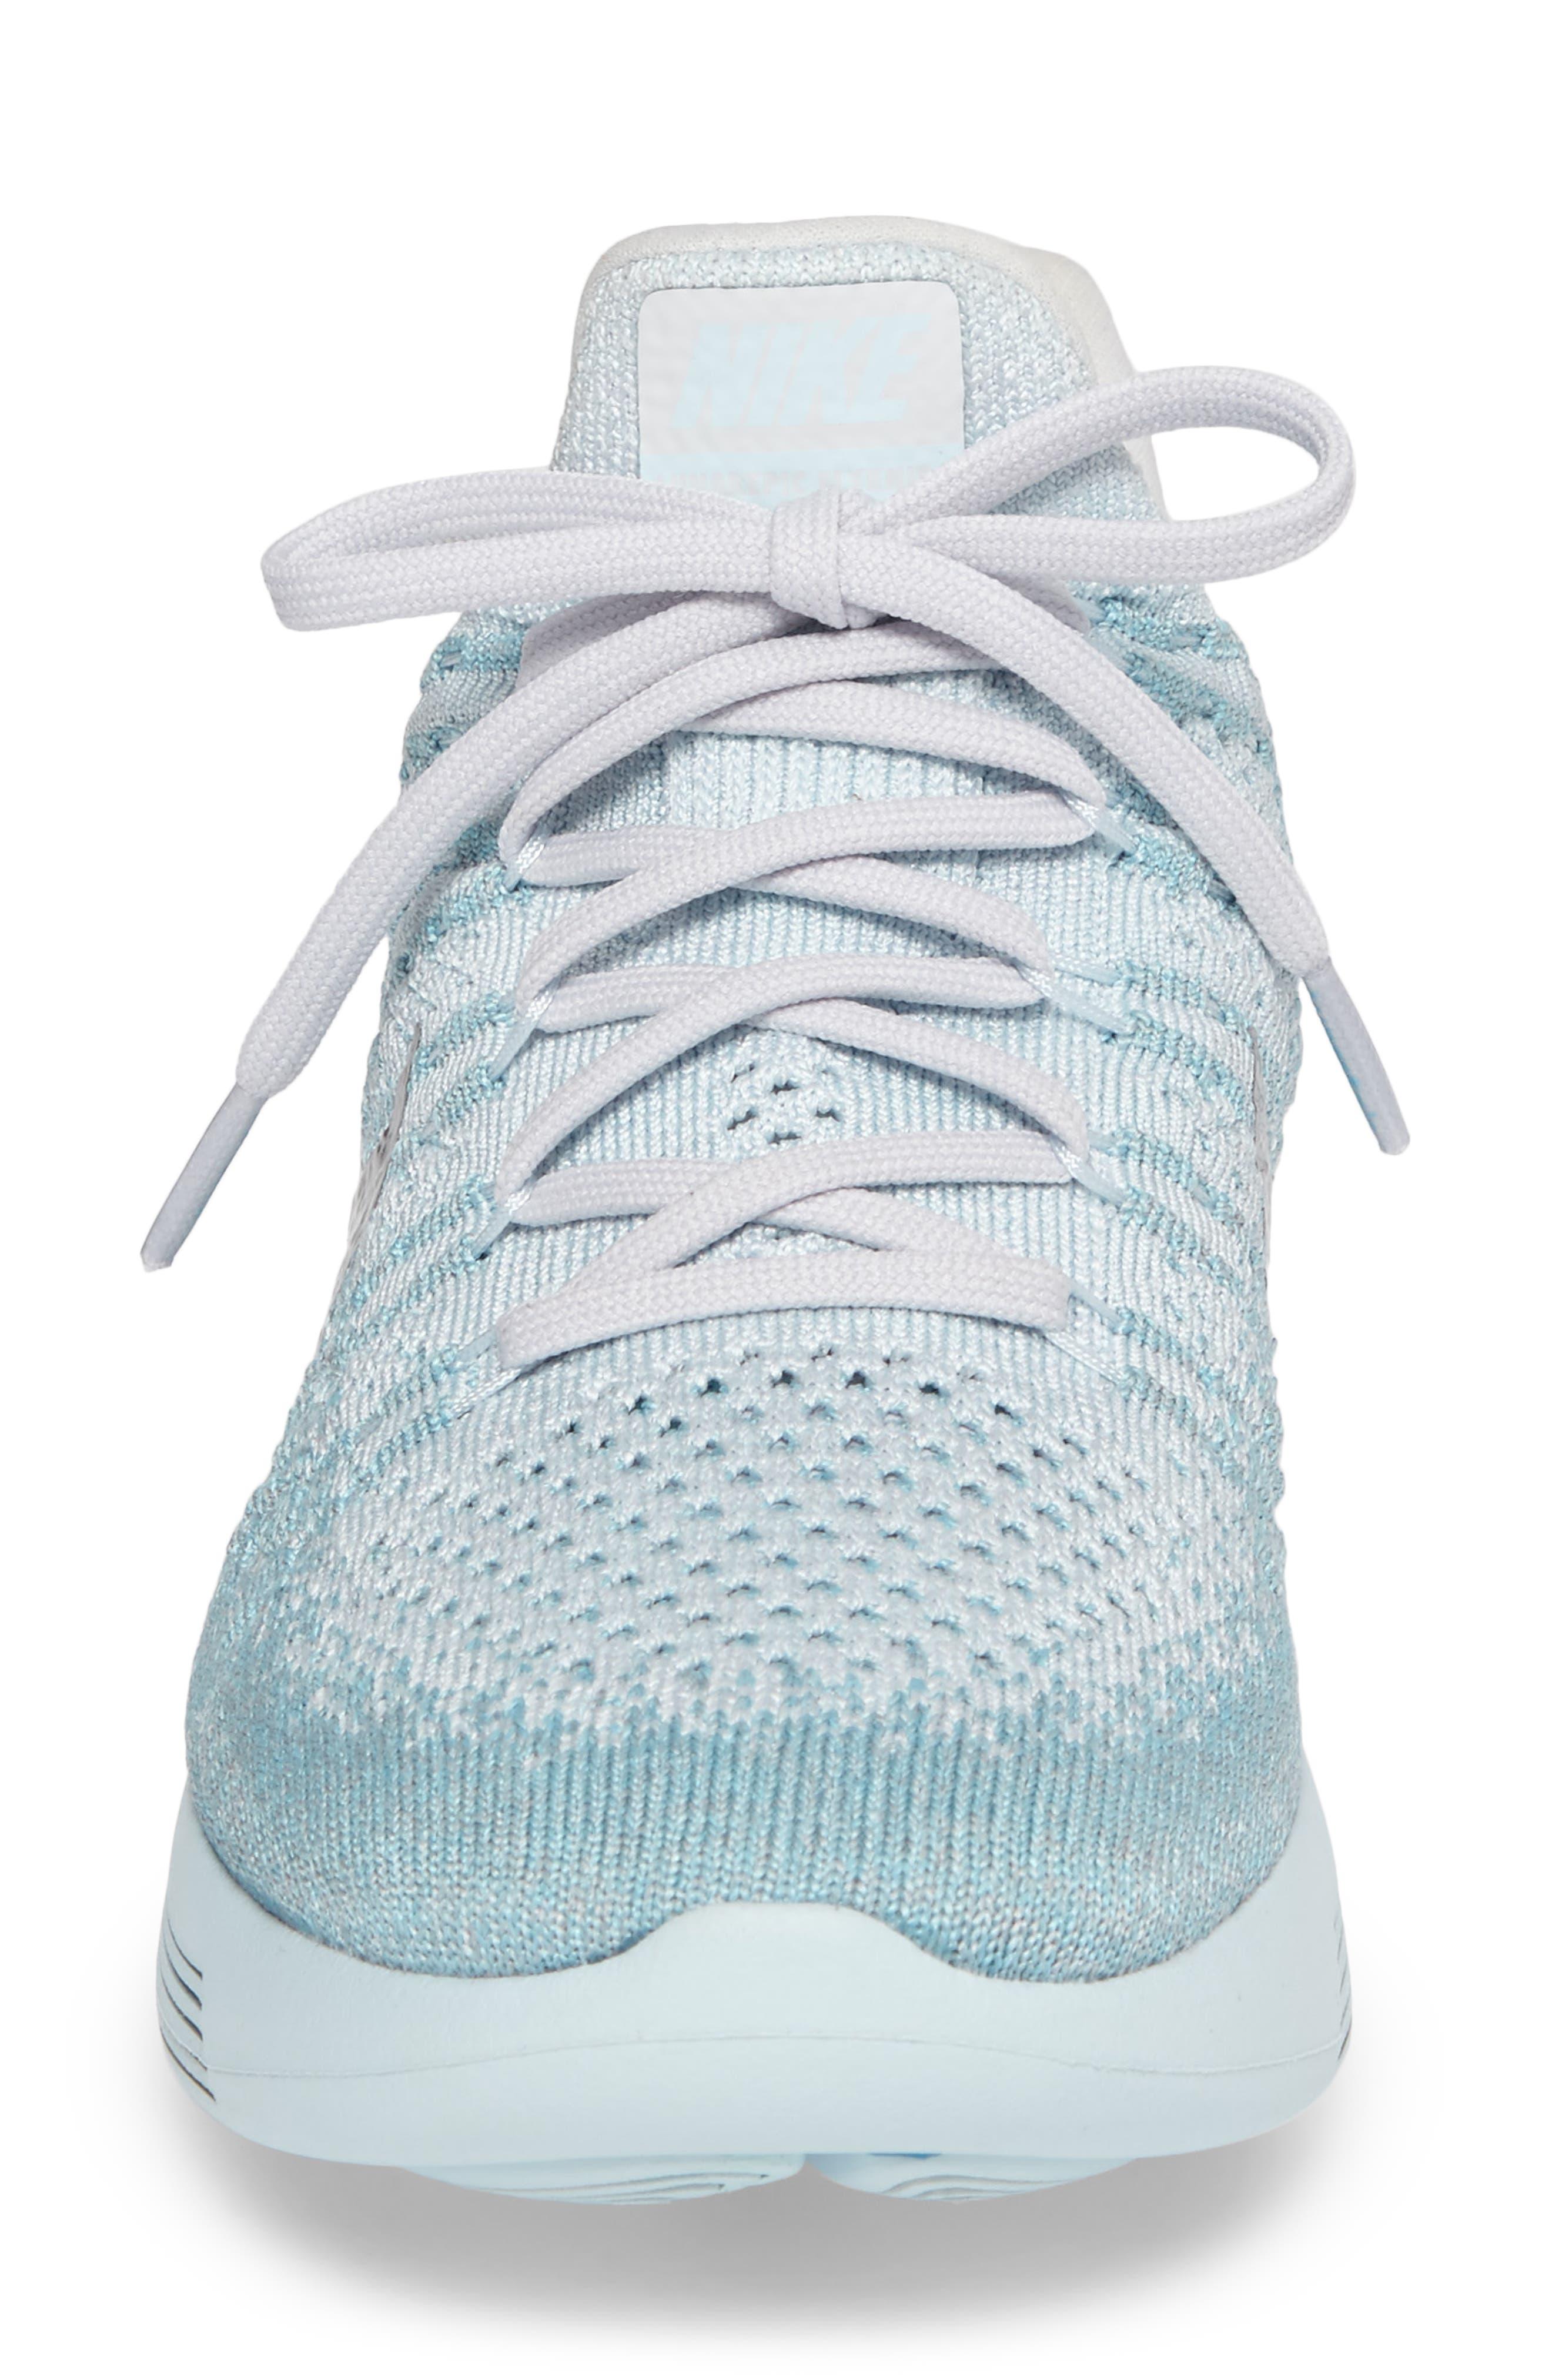 LunarEpic Low Flyknit 2 Running Shoe,                             Alternate thumbnail 65, color,